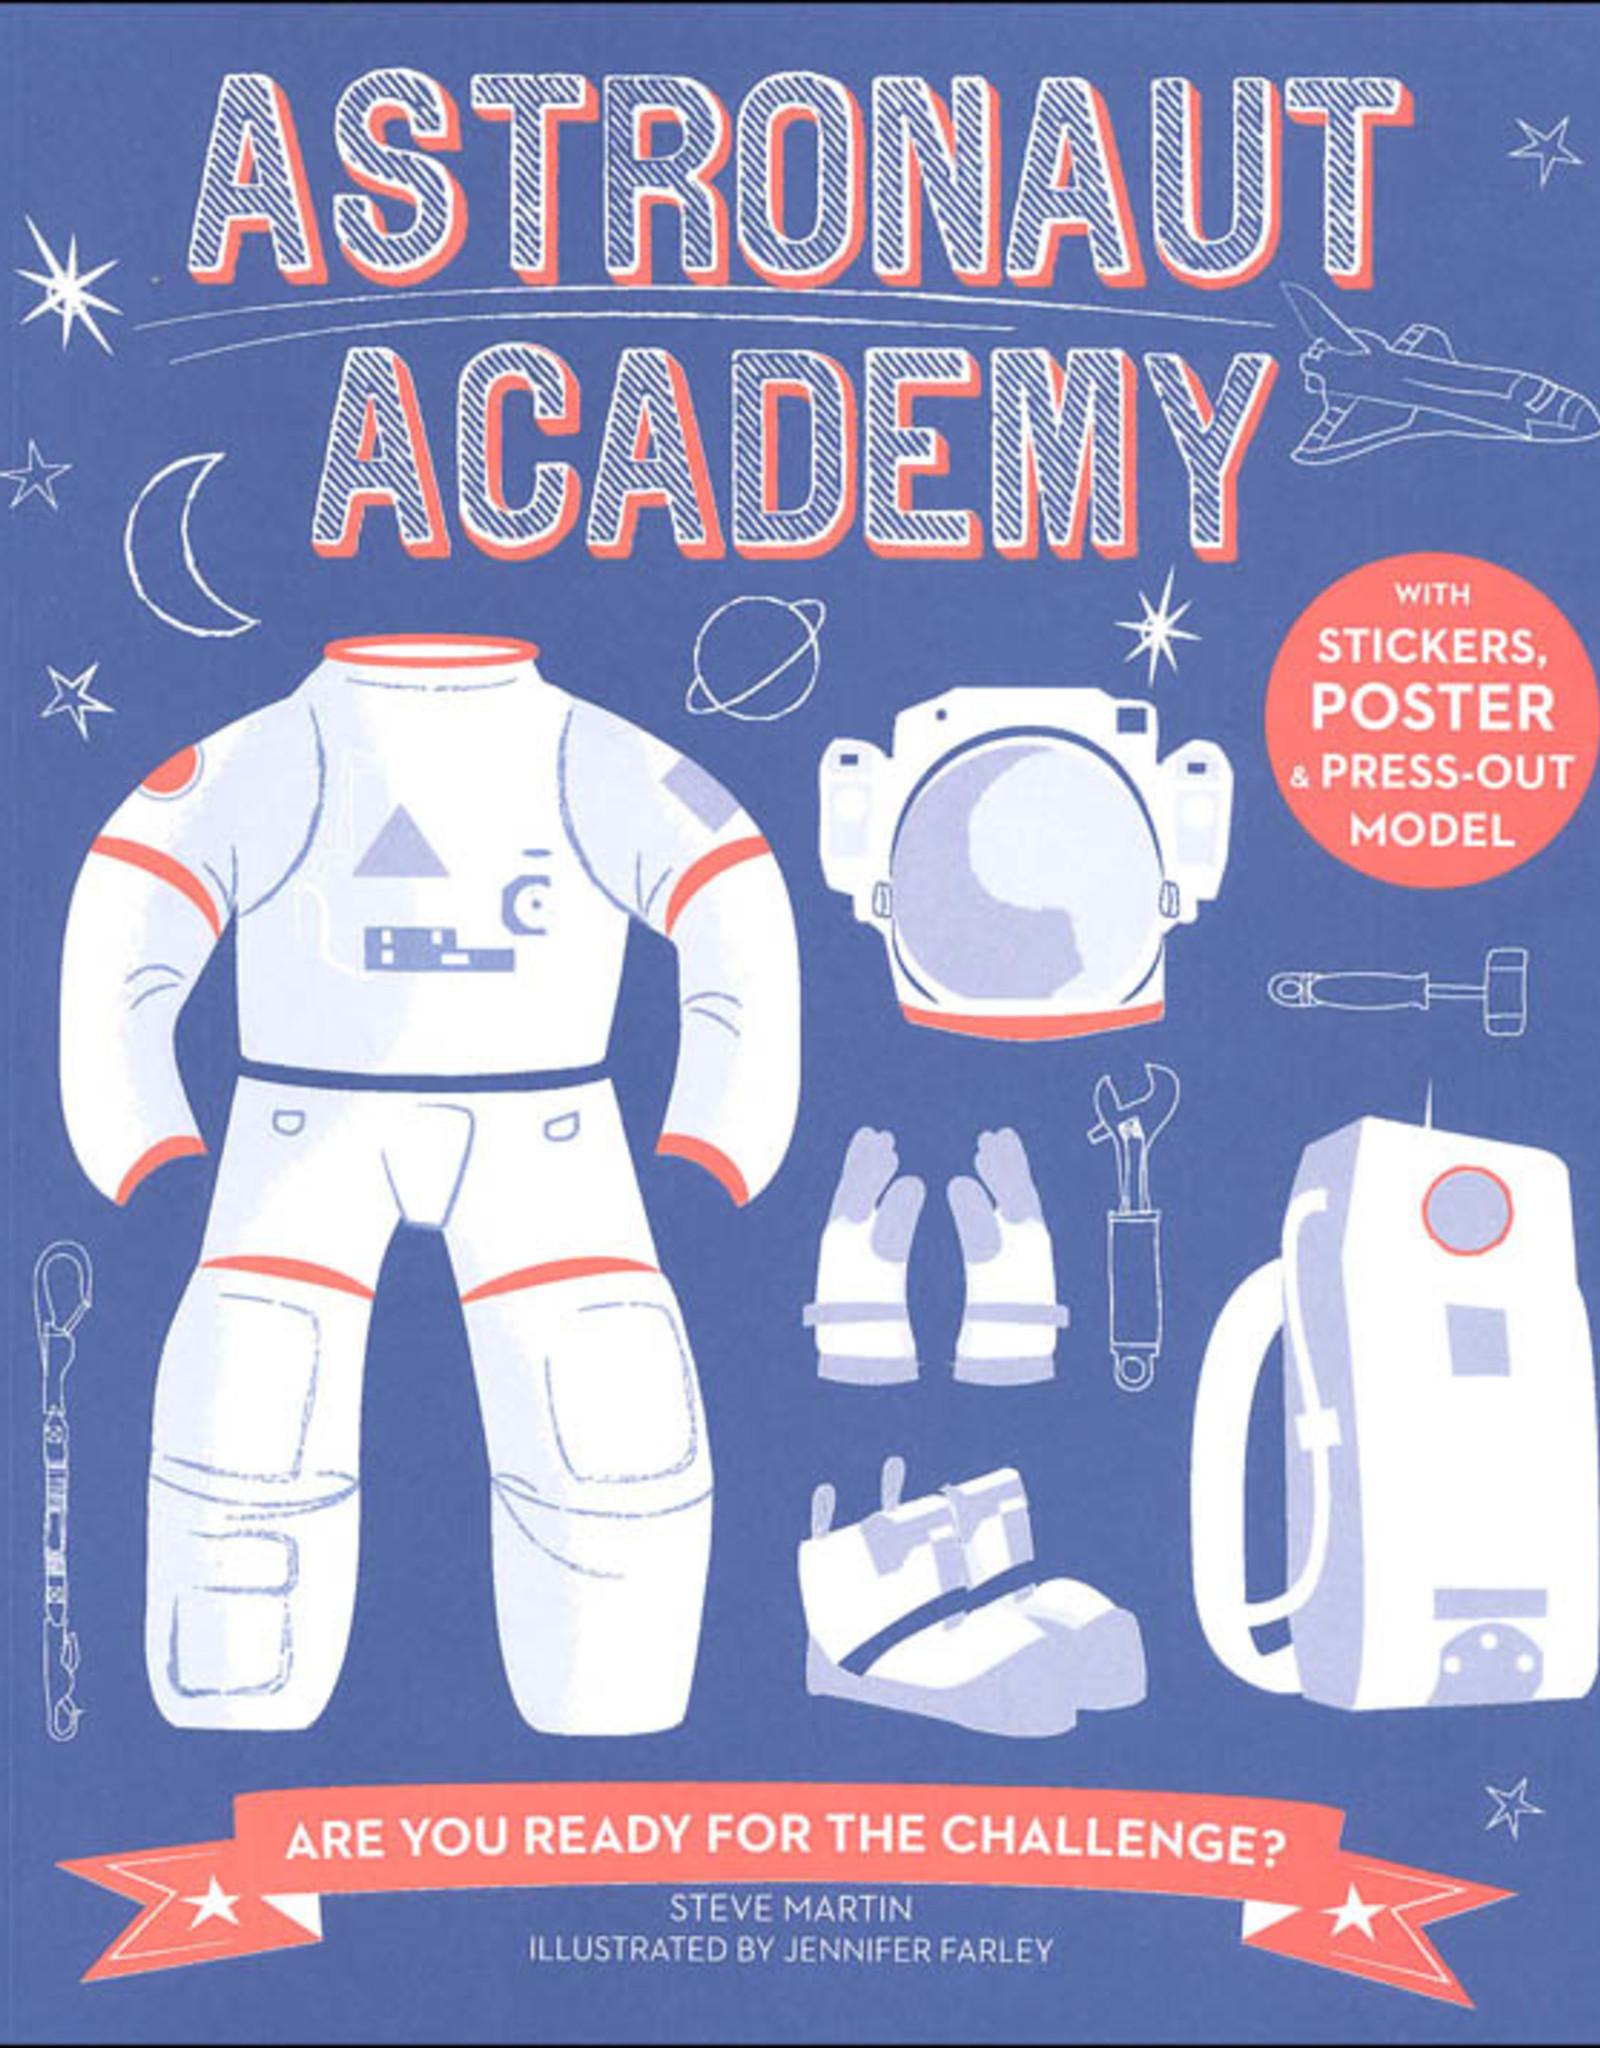 EDC Astronaut Academy